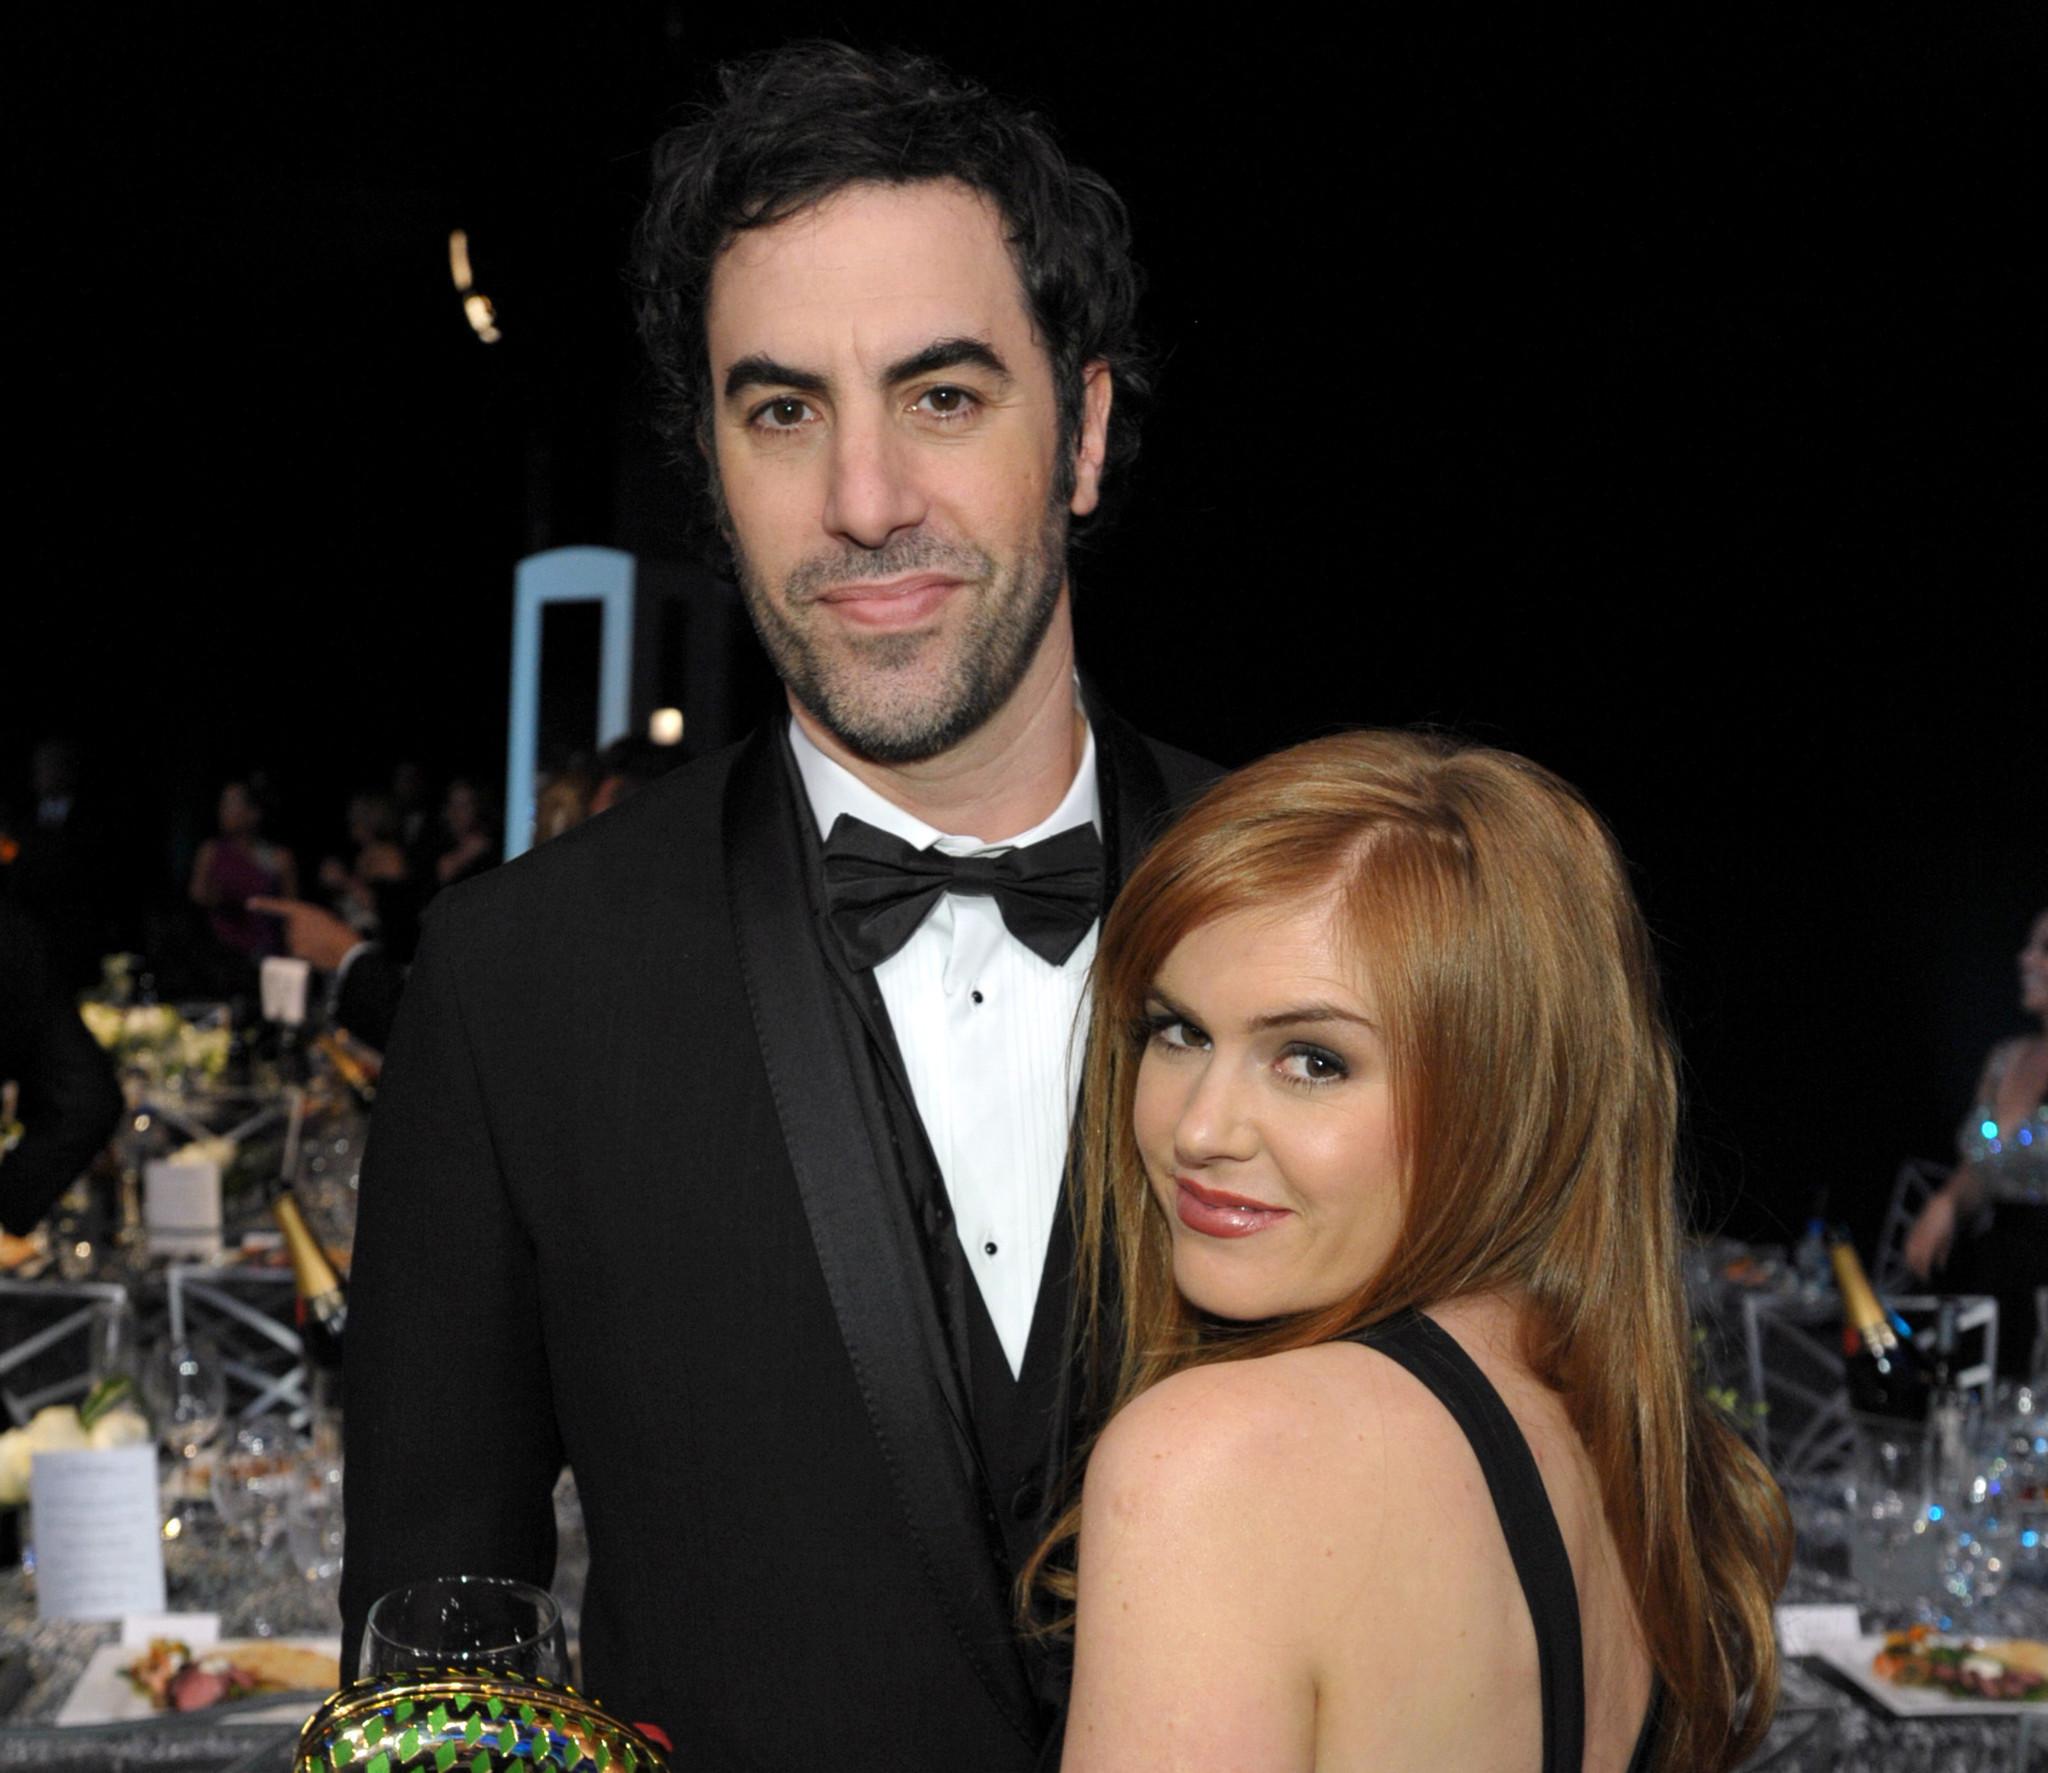 'Borat' actor Sacha Baron Cohen, wife fund help for Syria ...Sacha Baron Cohen Wife